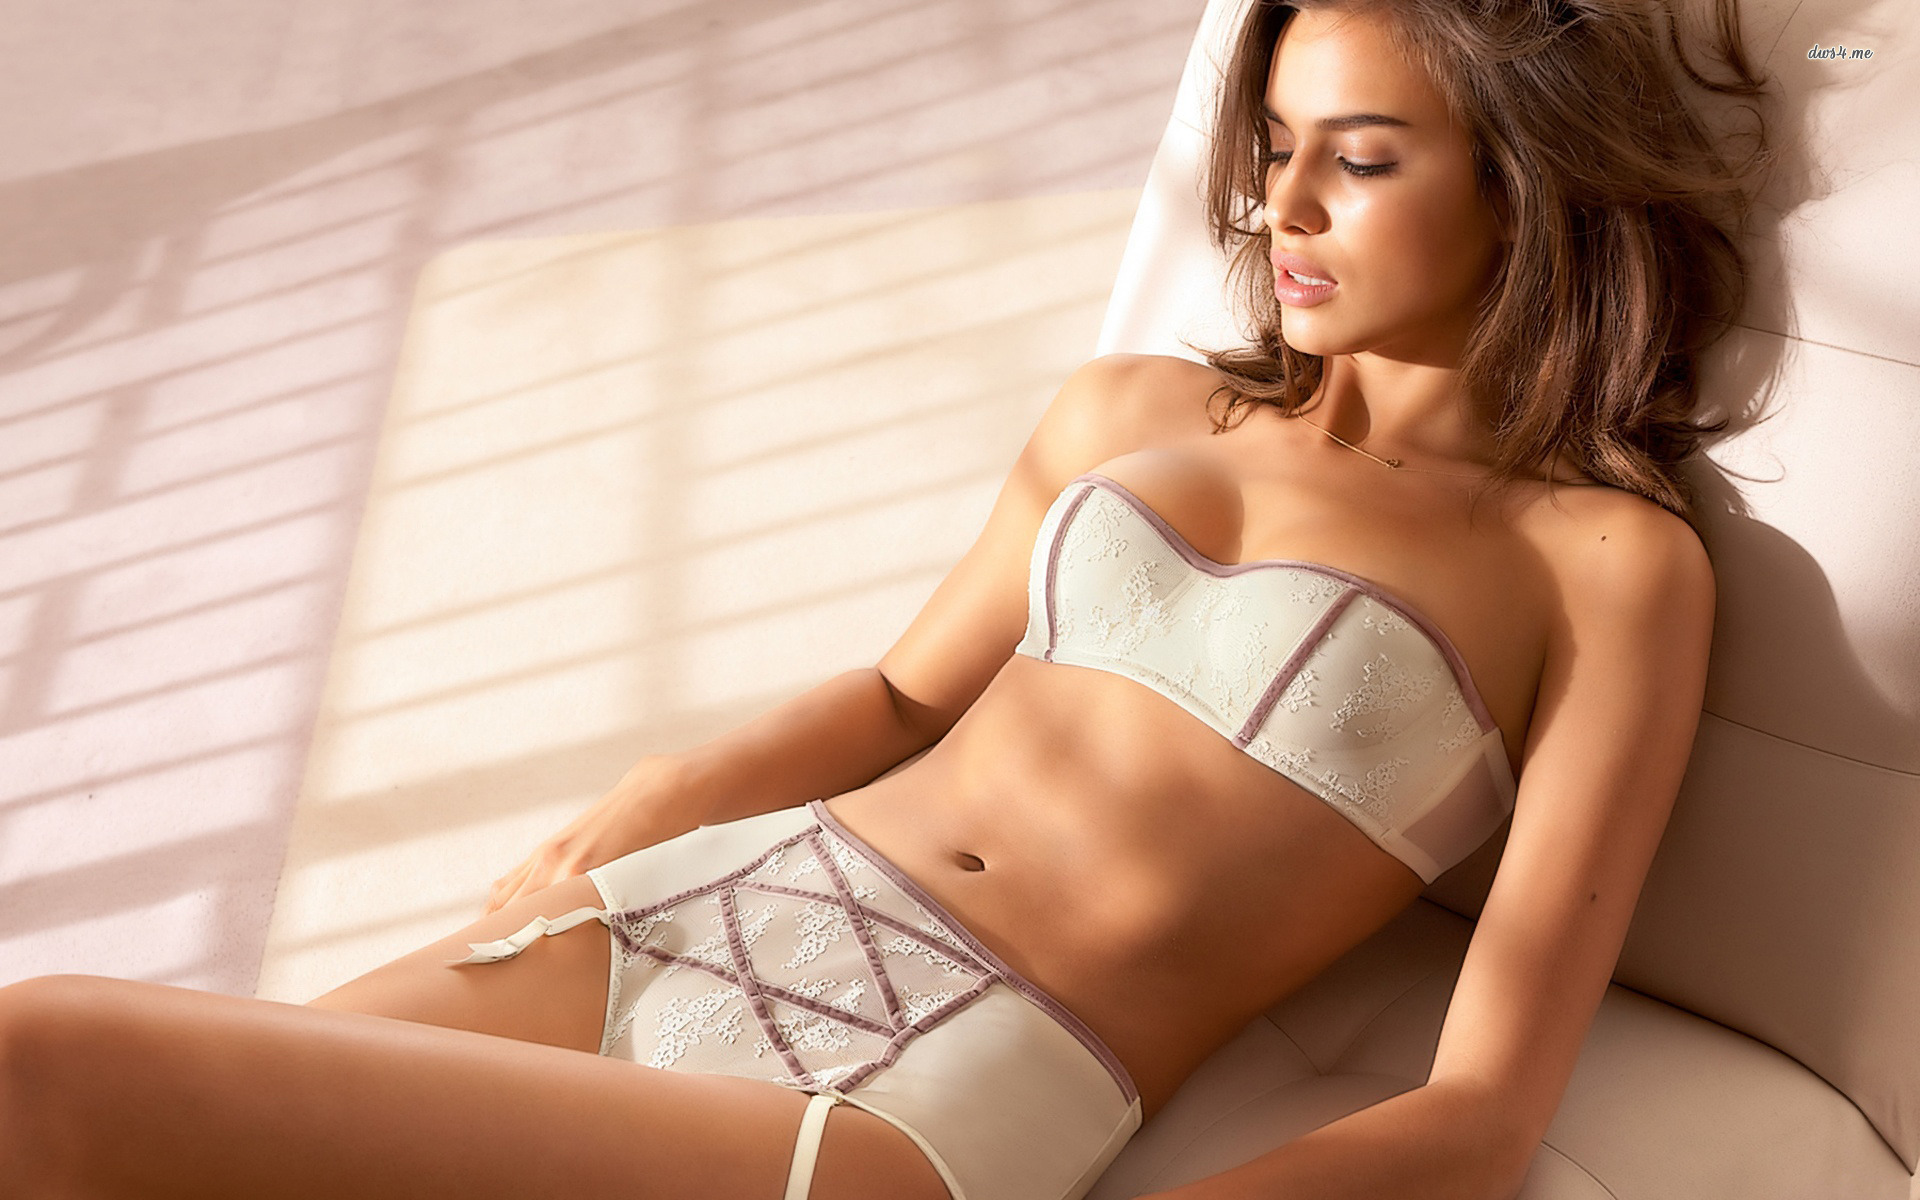 Irina Shayk lingerie lying down smooth skin